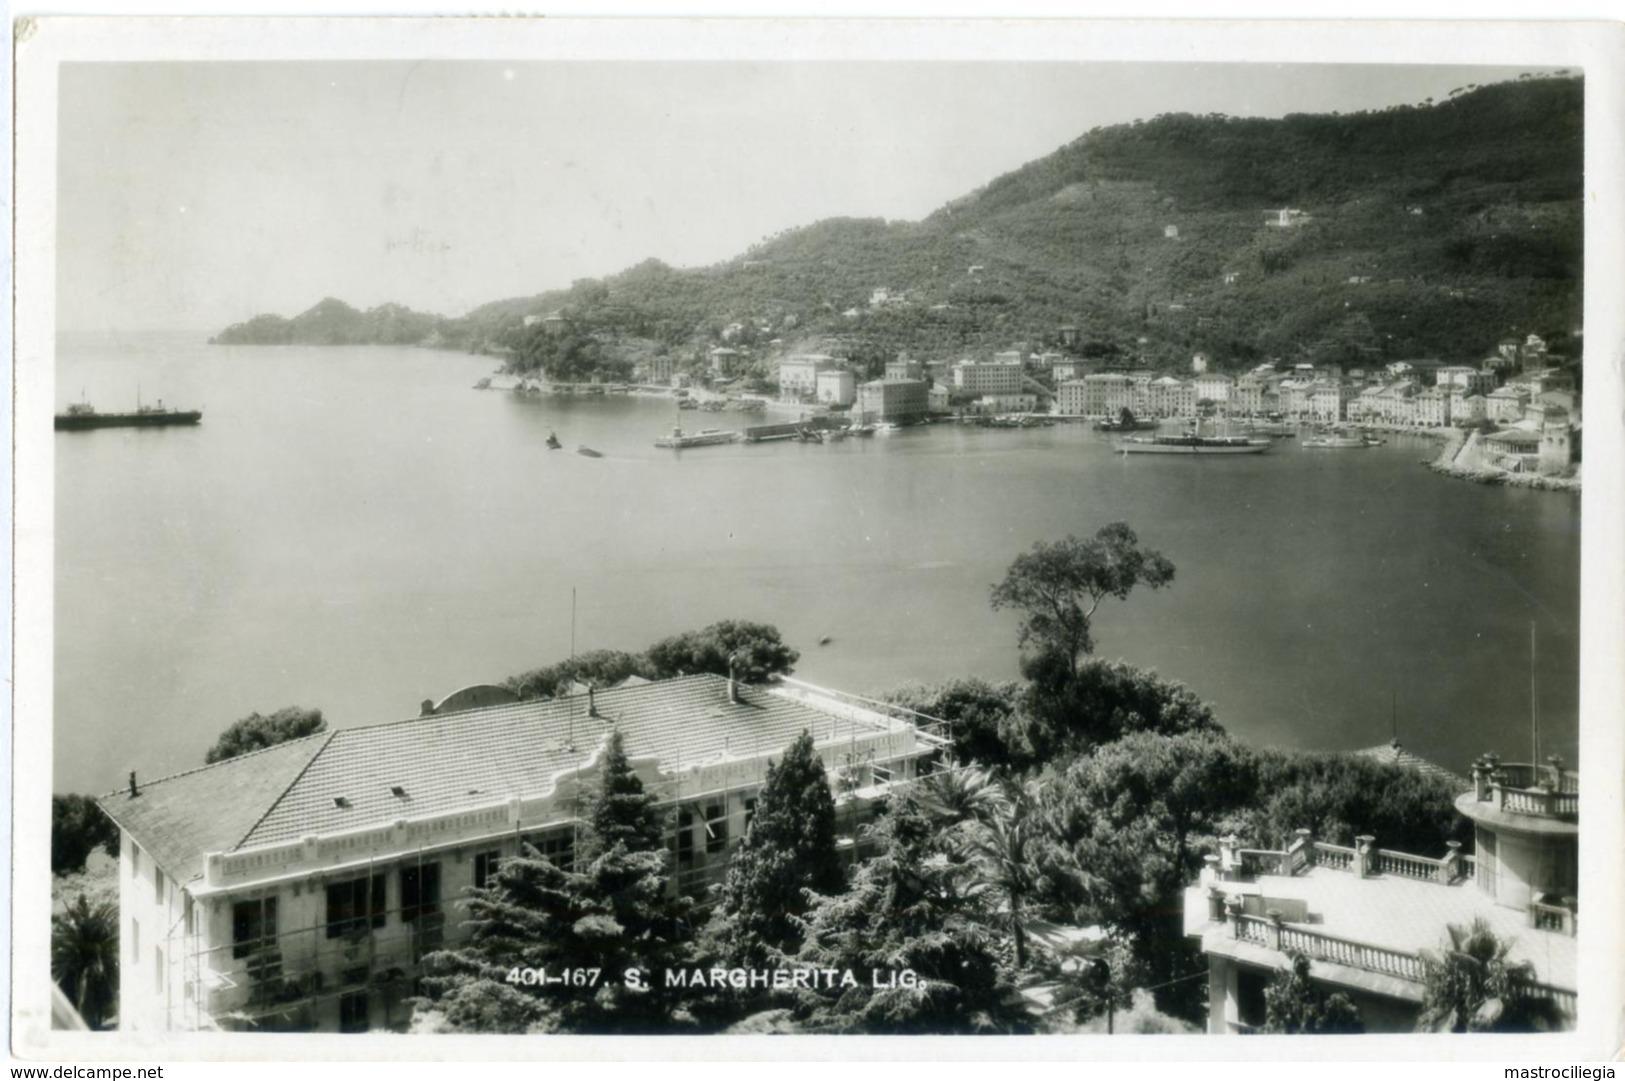 MARCONI G. 20c. + IMPERIALE 50 C. Da Genova Per Posta Speciale 500 1938 Guerra Di Spagna  Card Santa Margherita Ligure - Storia Postale